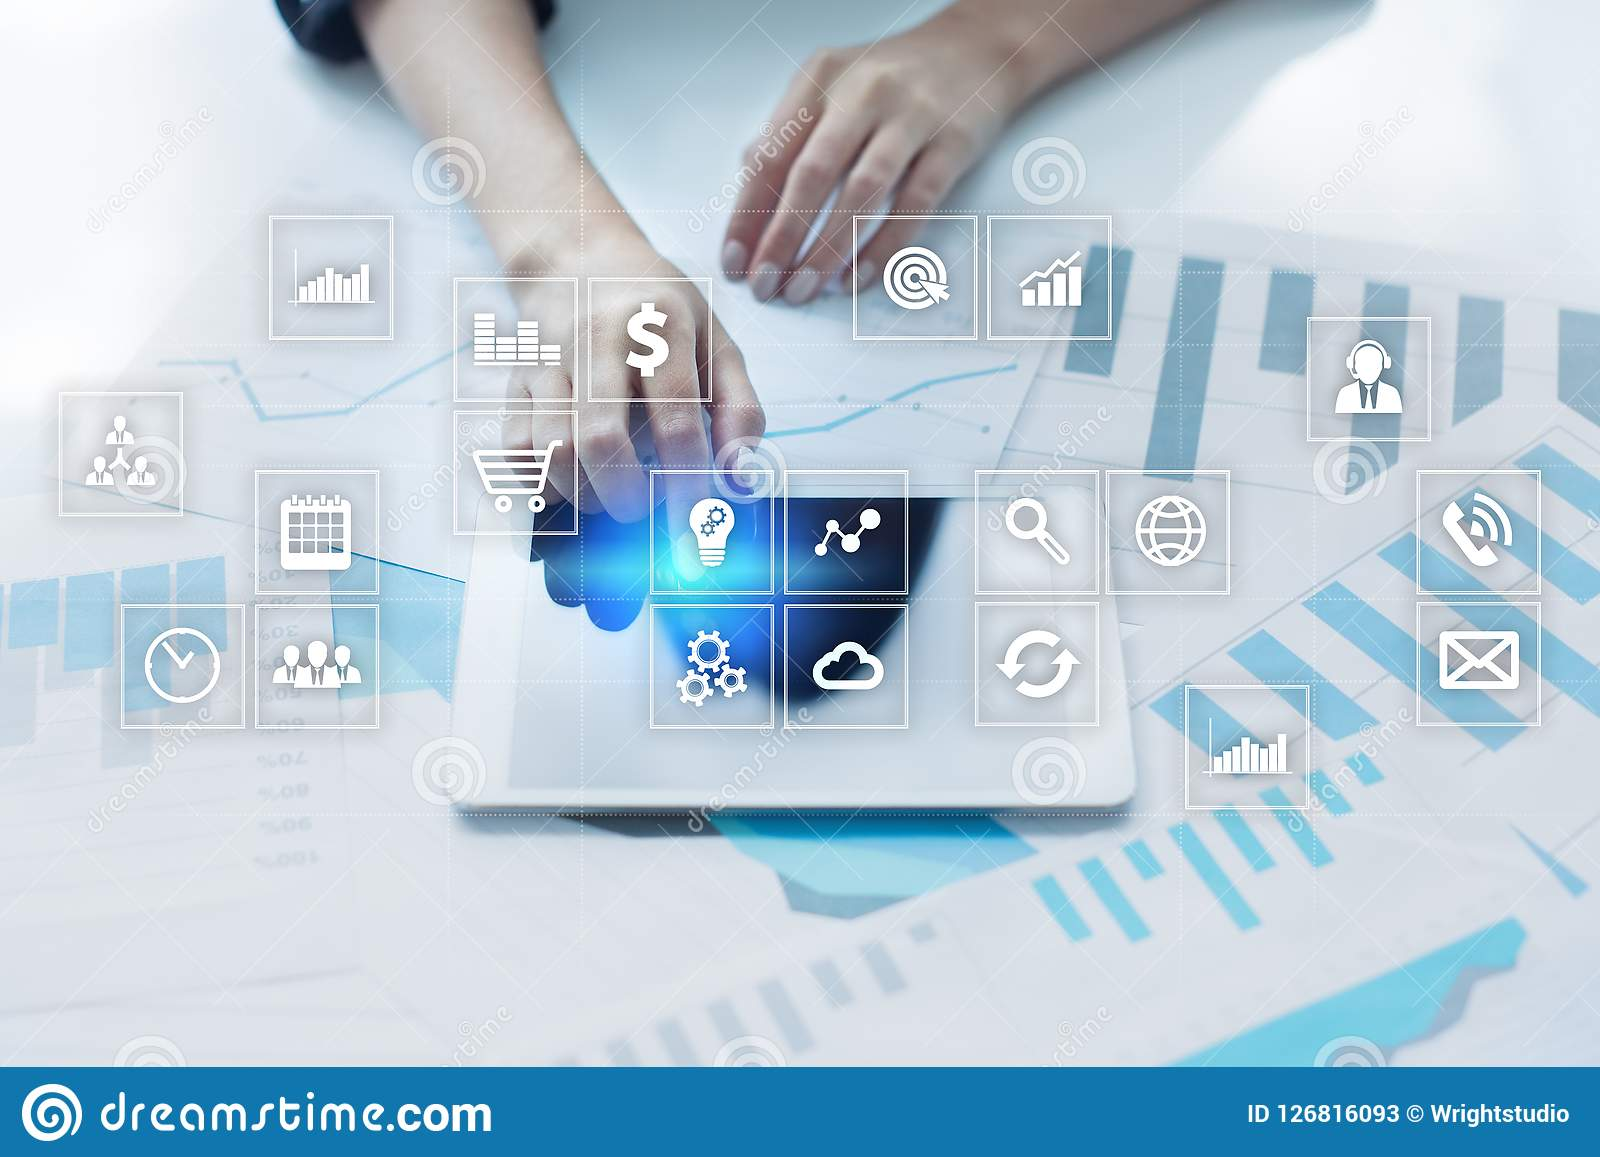 virtual office india